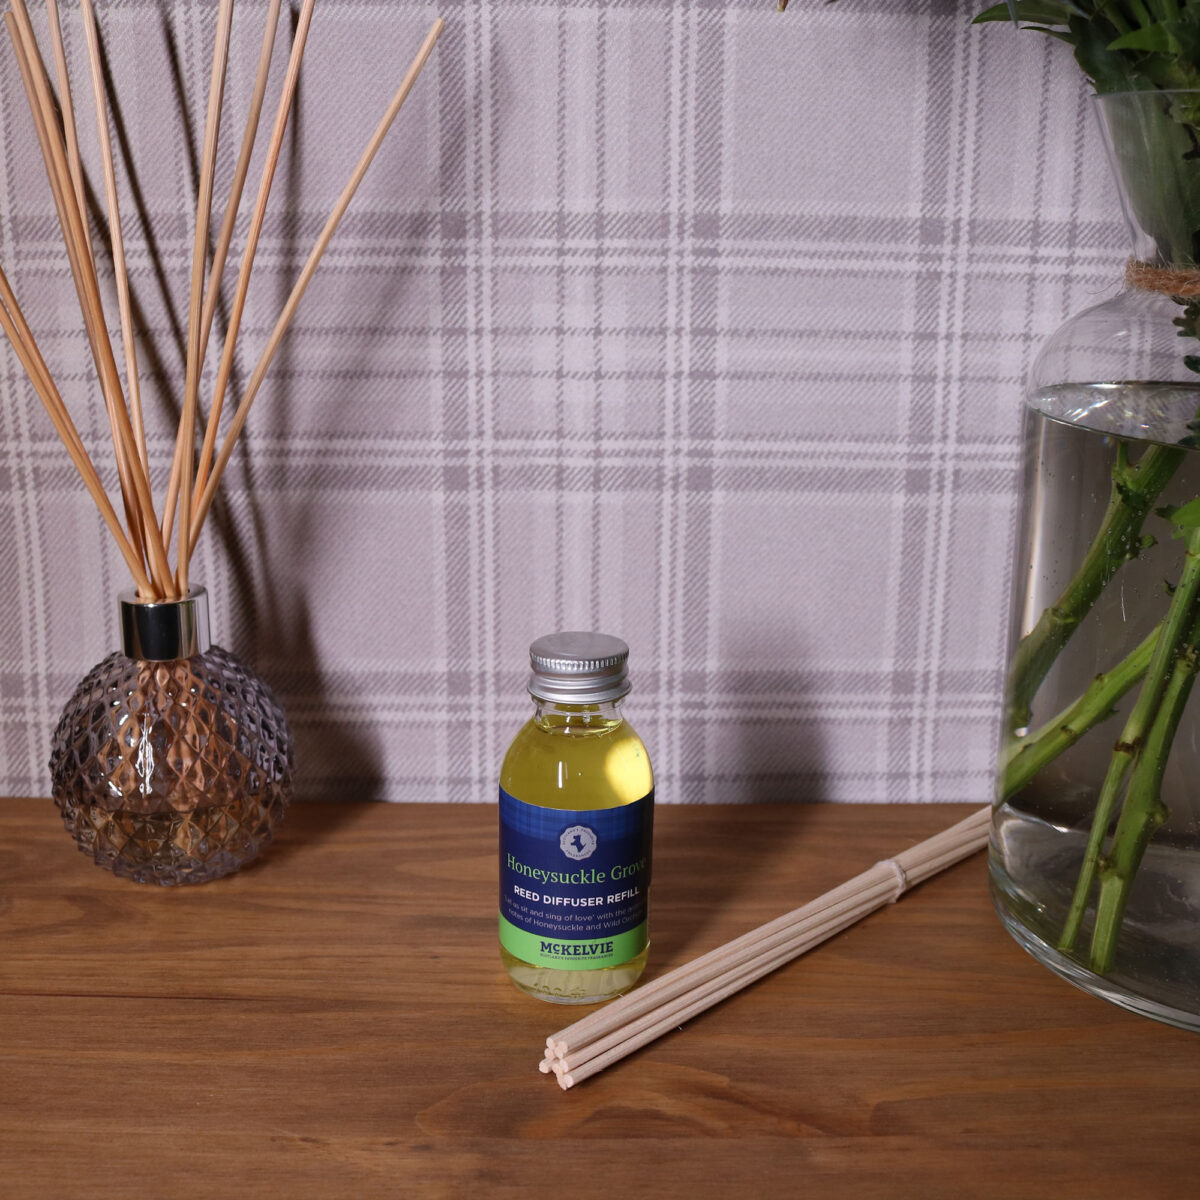 Honeysuckle Grove Reed Diffuser Refill